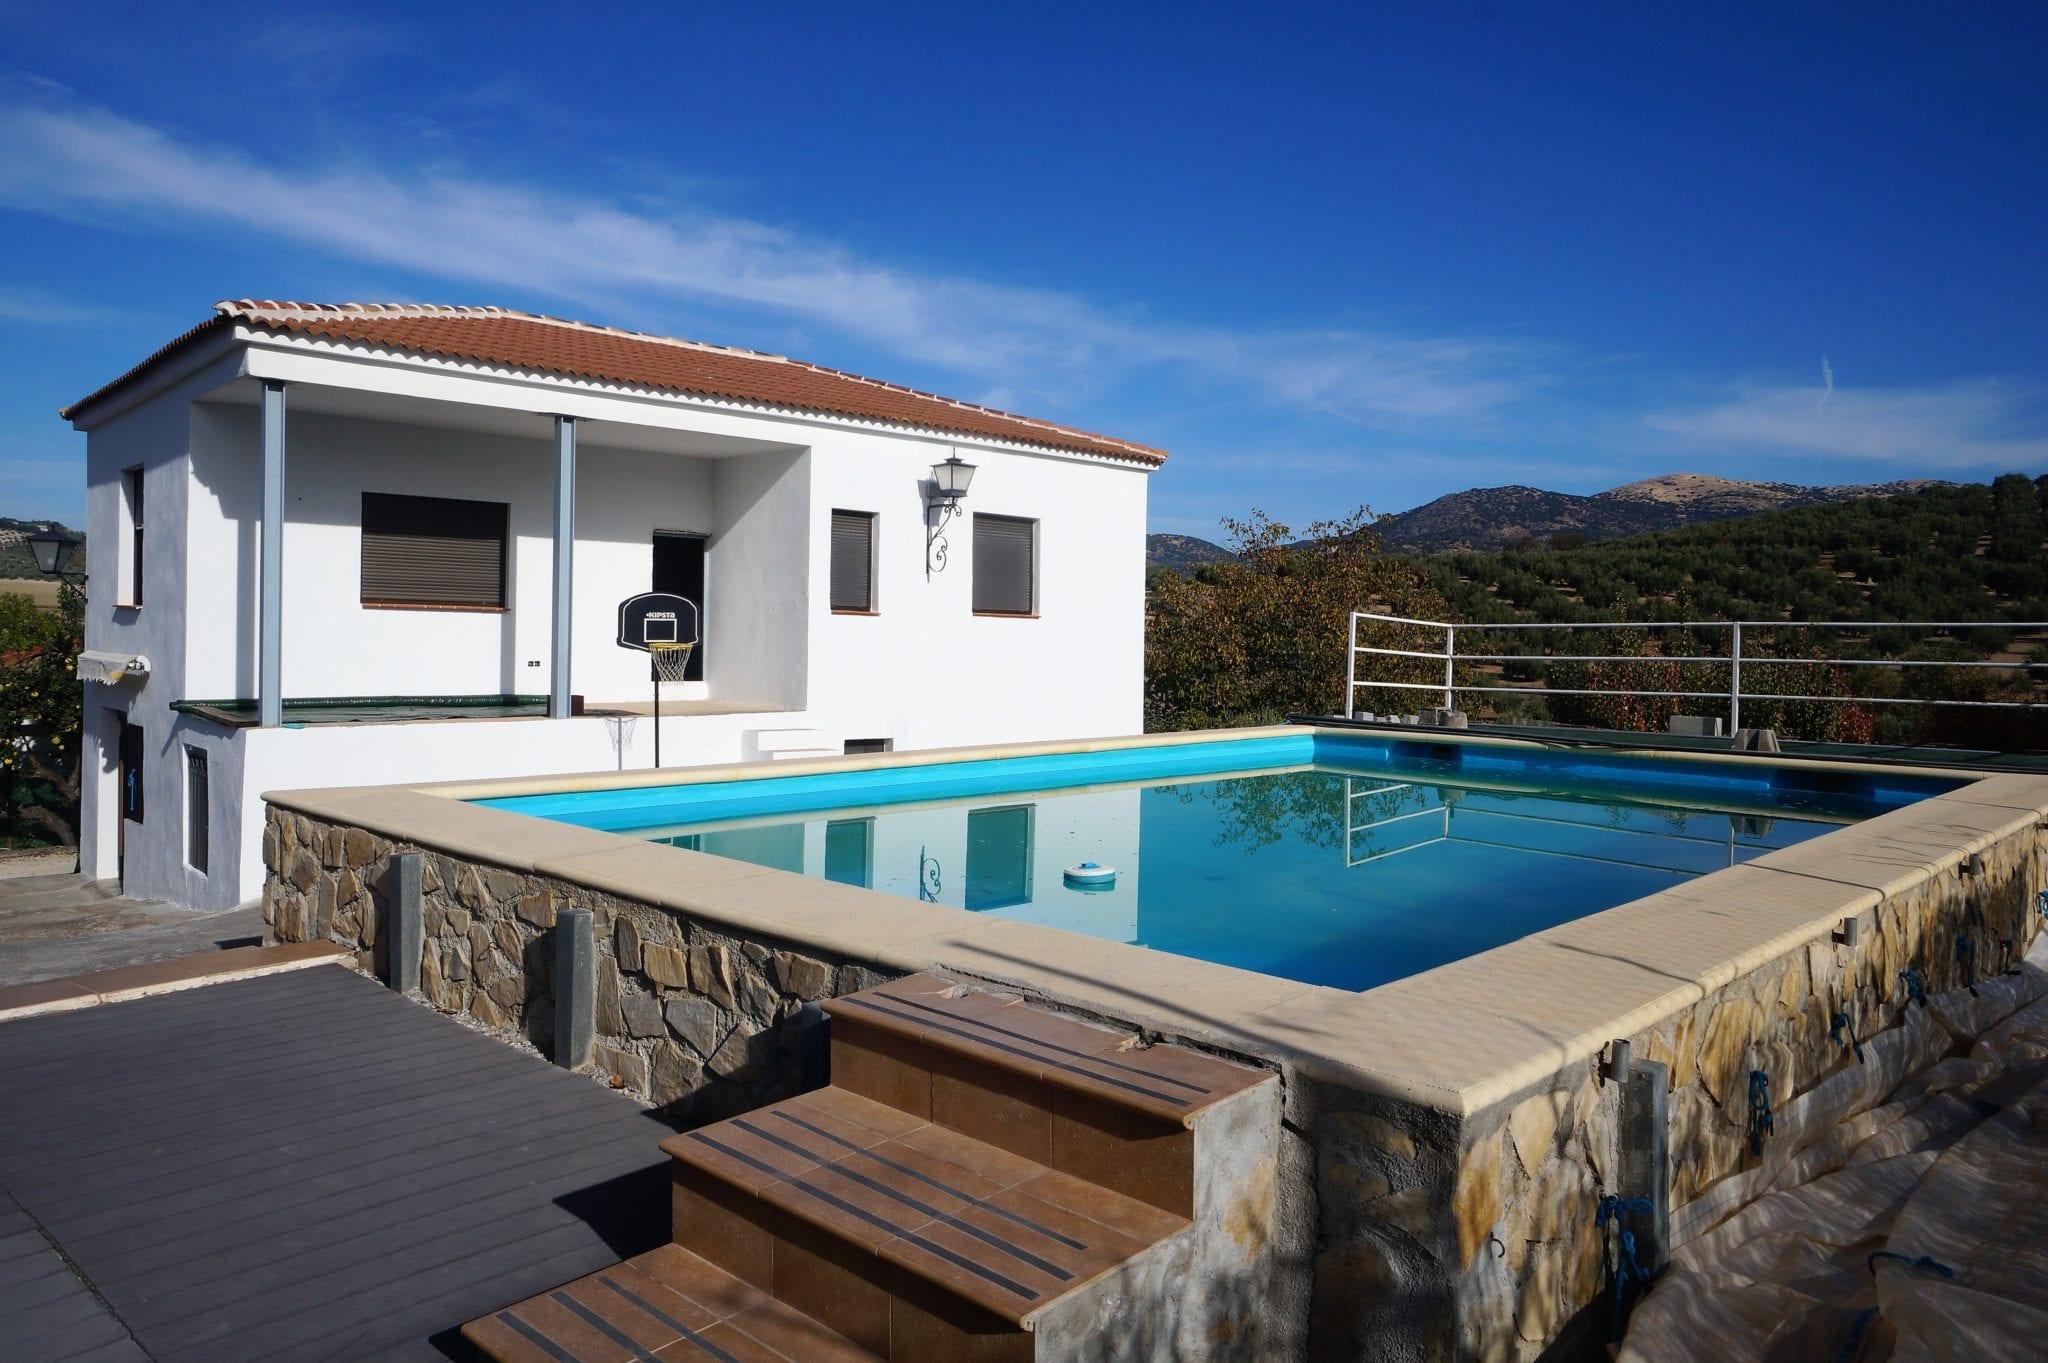 Casa de Campo a 10 km de Alcala.